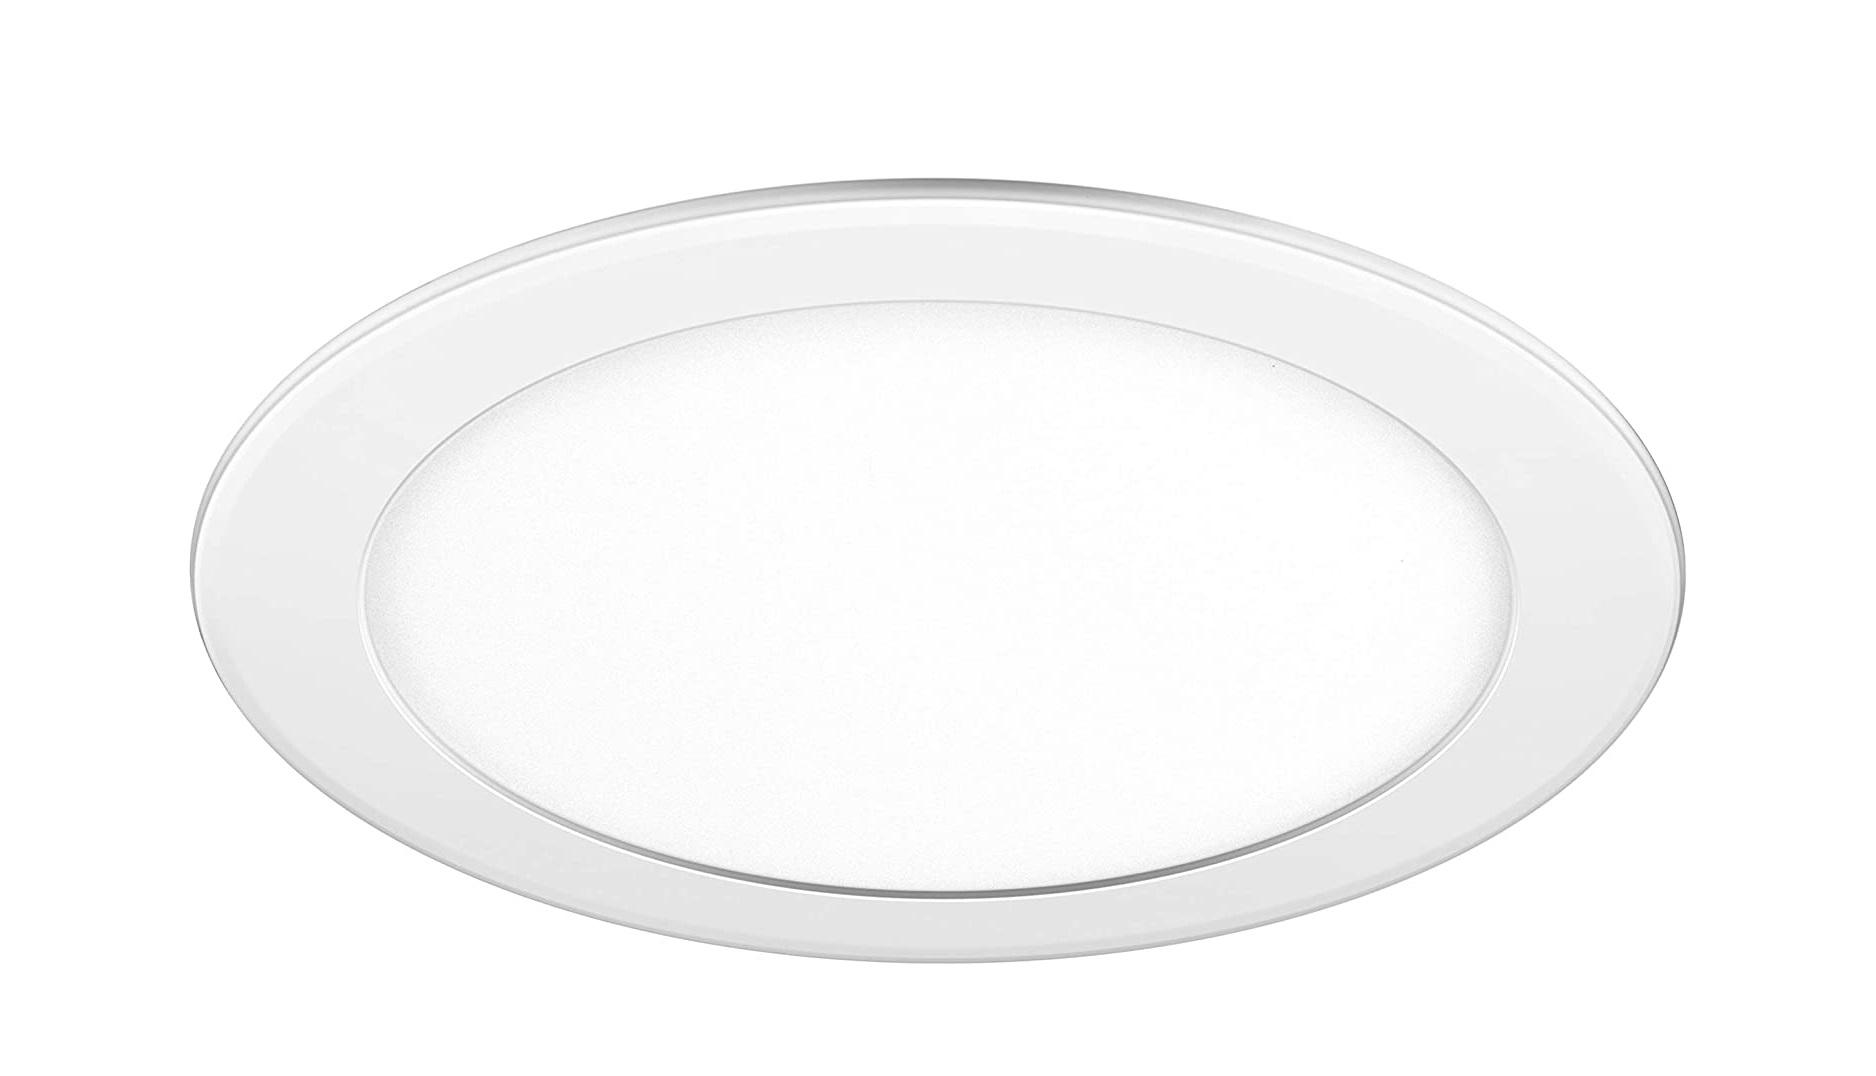 Luminária painel Led de embutir redonda 12W 6500K Fria bivolt Elgin  - Mix Eletro